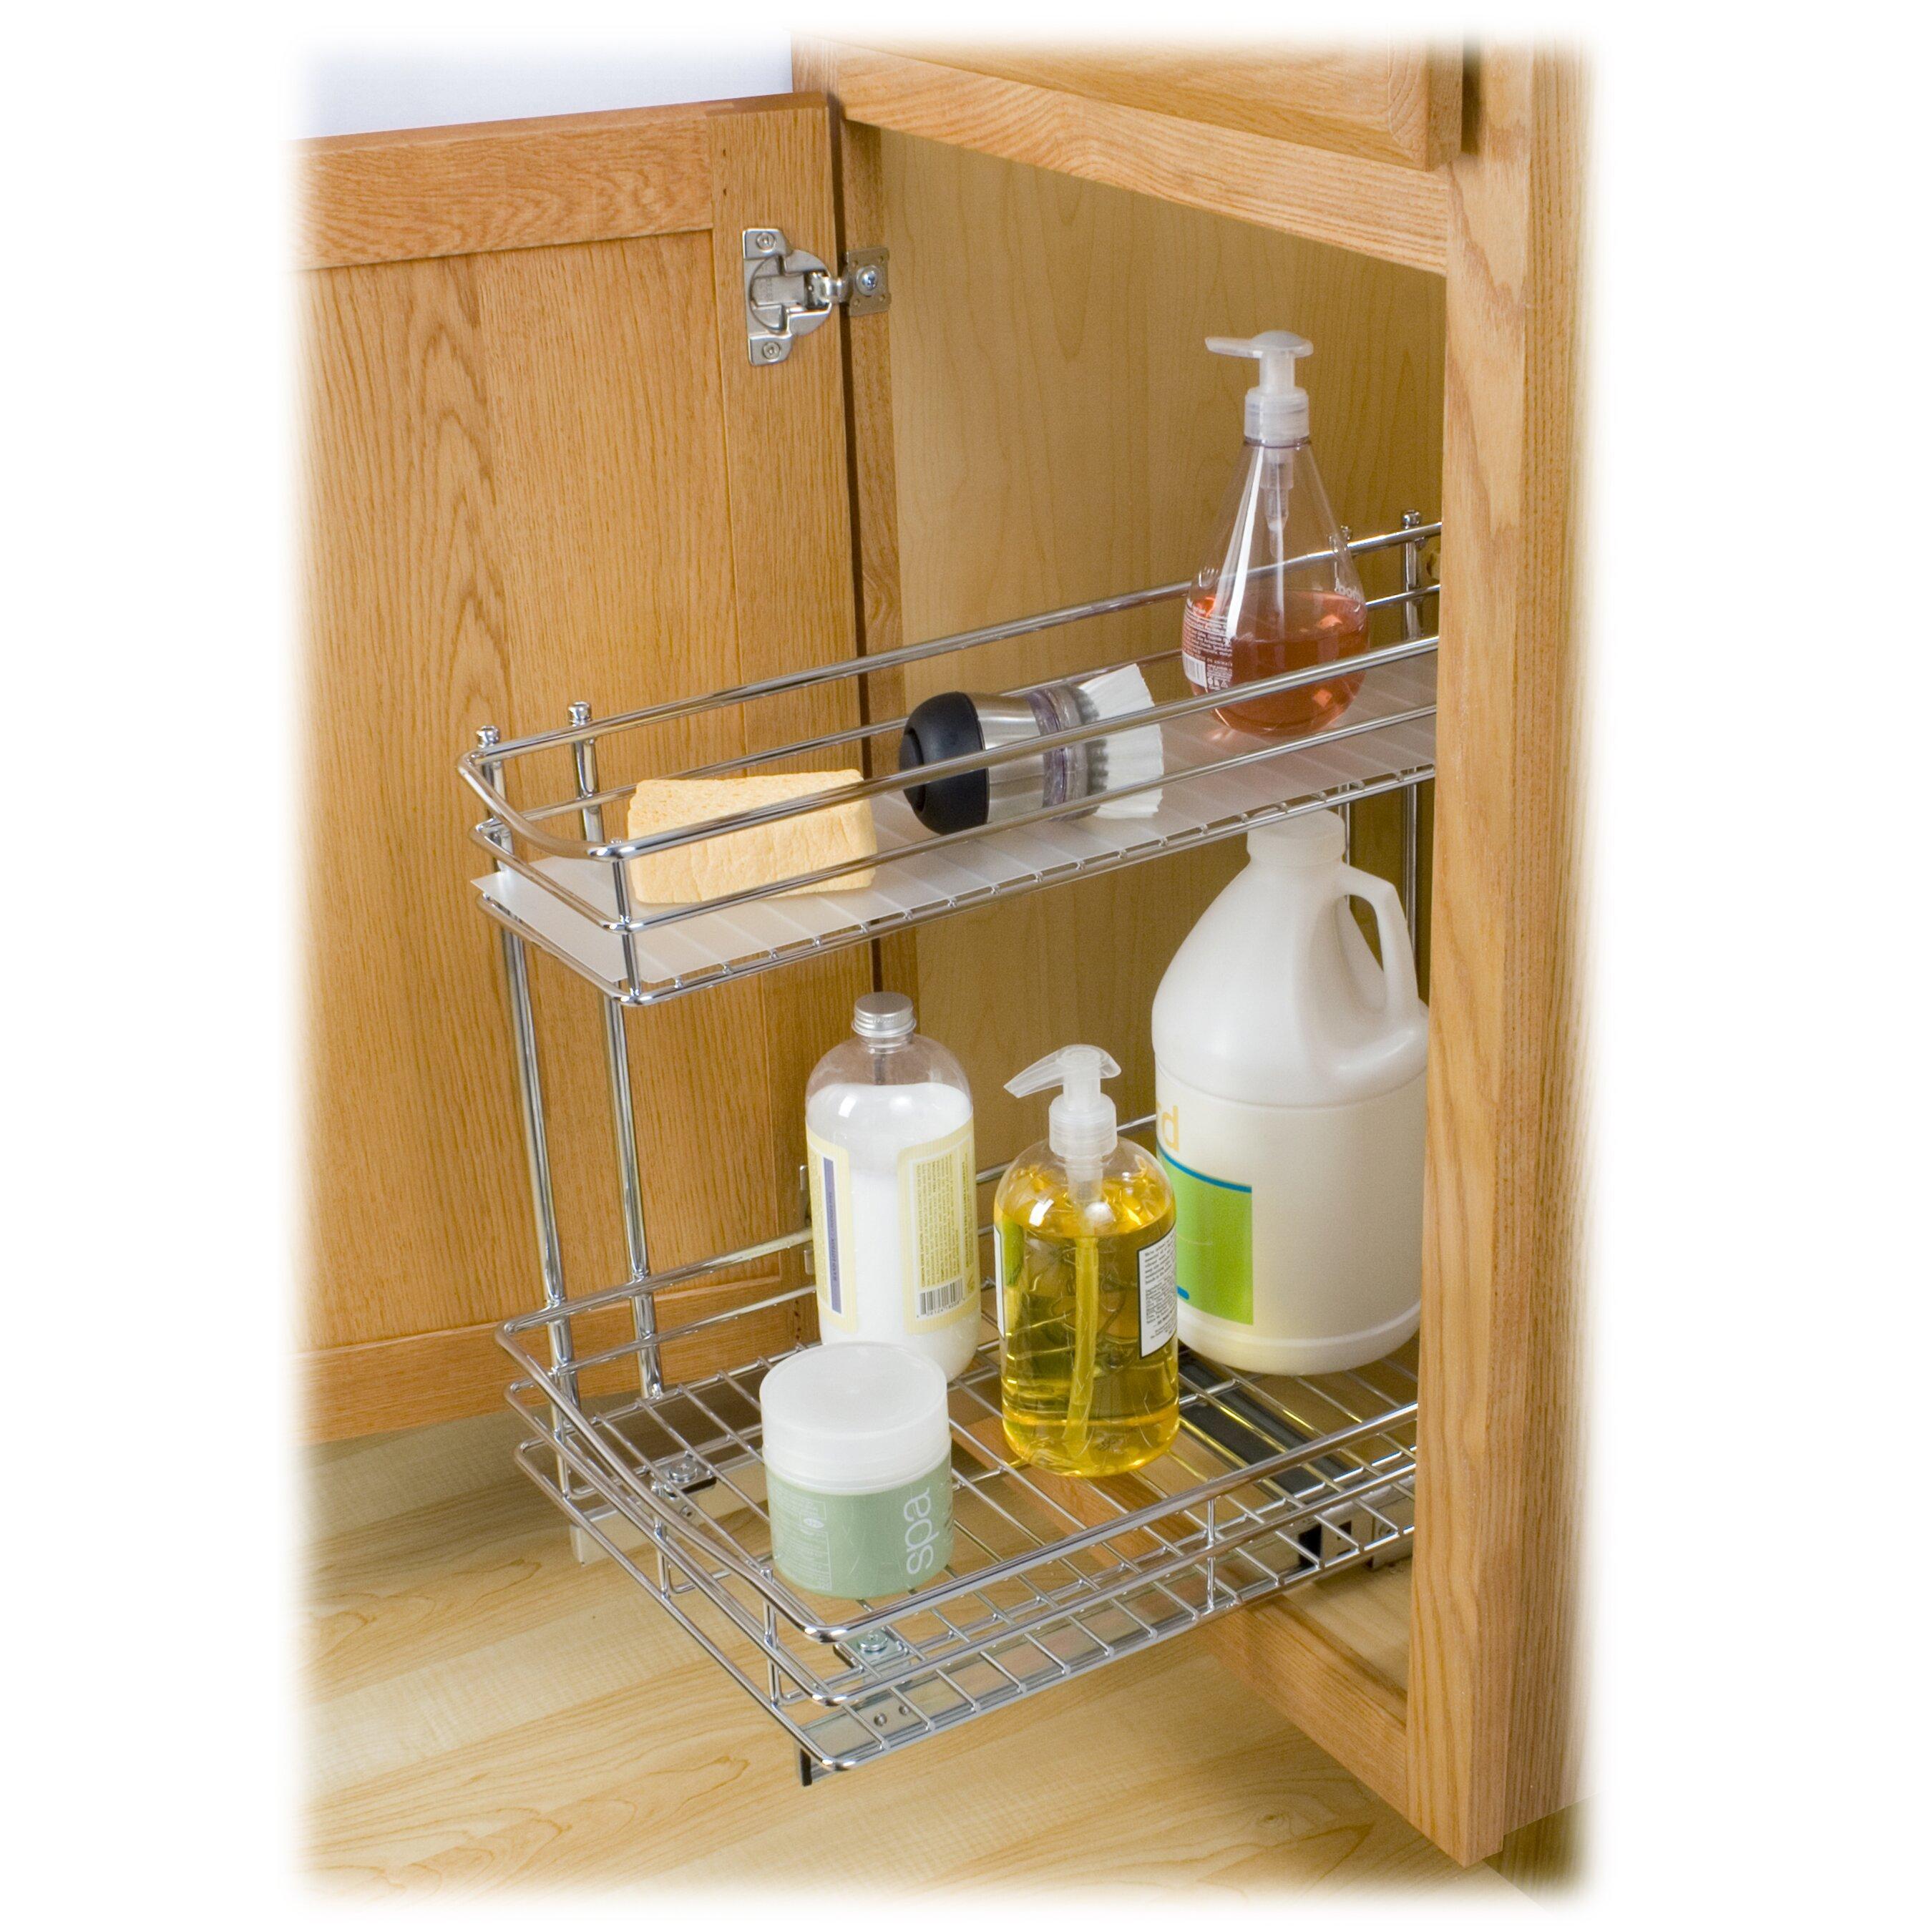 New Cabinet Organizer Sliding Kitchen Under Storage Drawer: Lynk Lynk Professional Roll Out Under Sink Cabinet